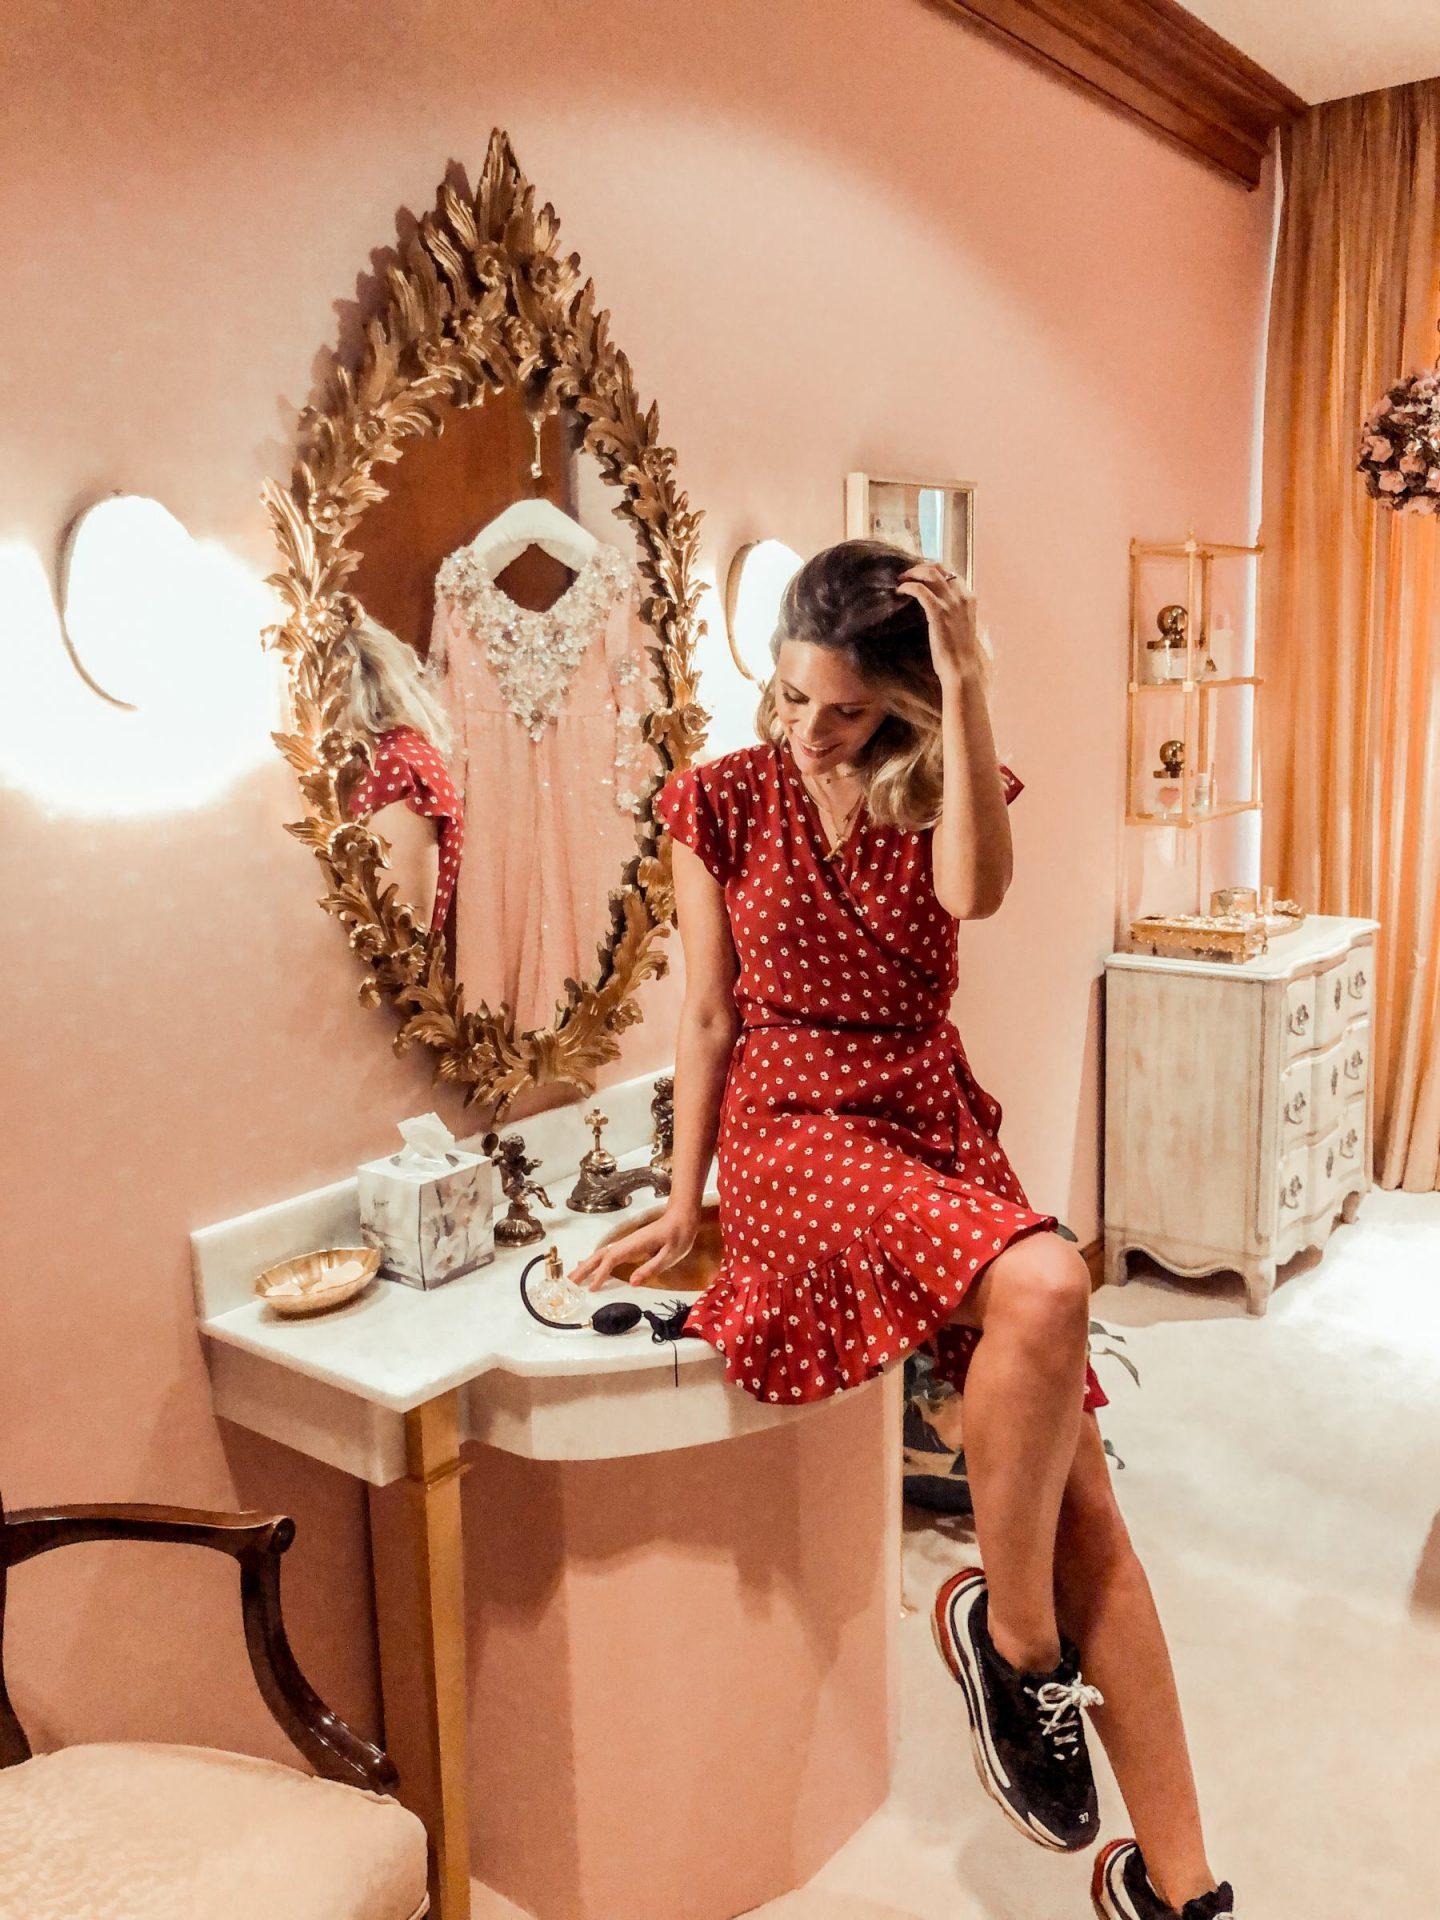 cadillac pink cute summer mary kay global beauty make up jessica chelsea cocoa texas chloe revolve pink bathroom